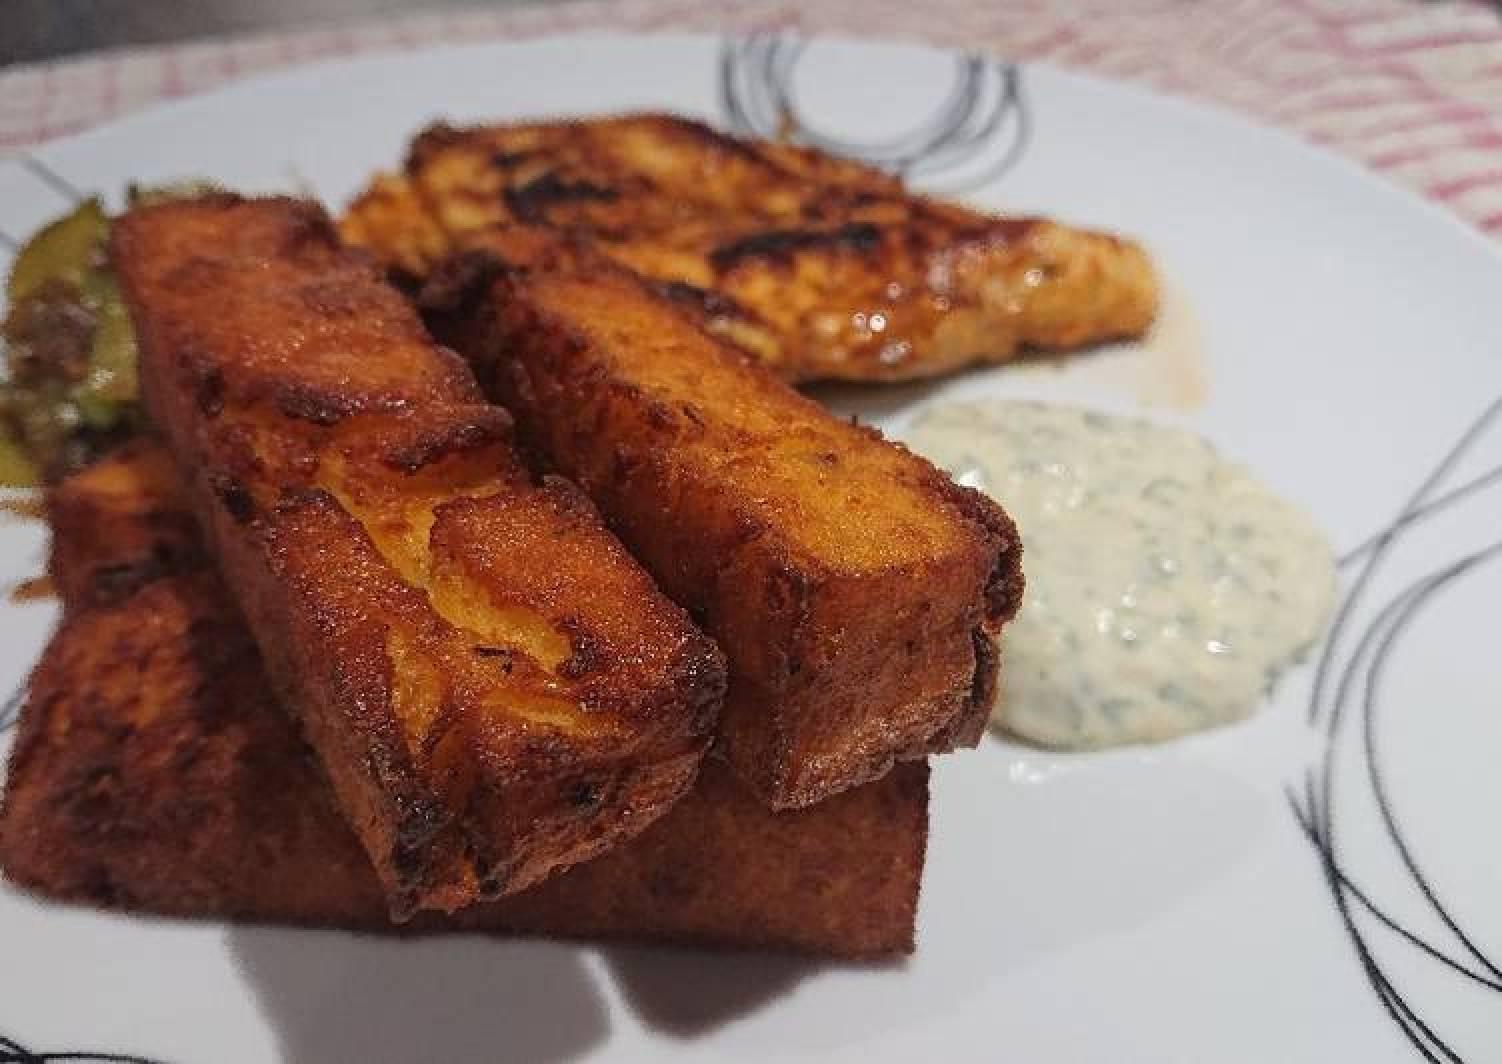 Polenta Chips with Roasted Garlic Aioli